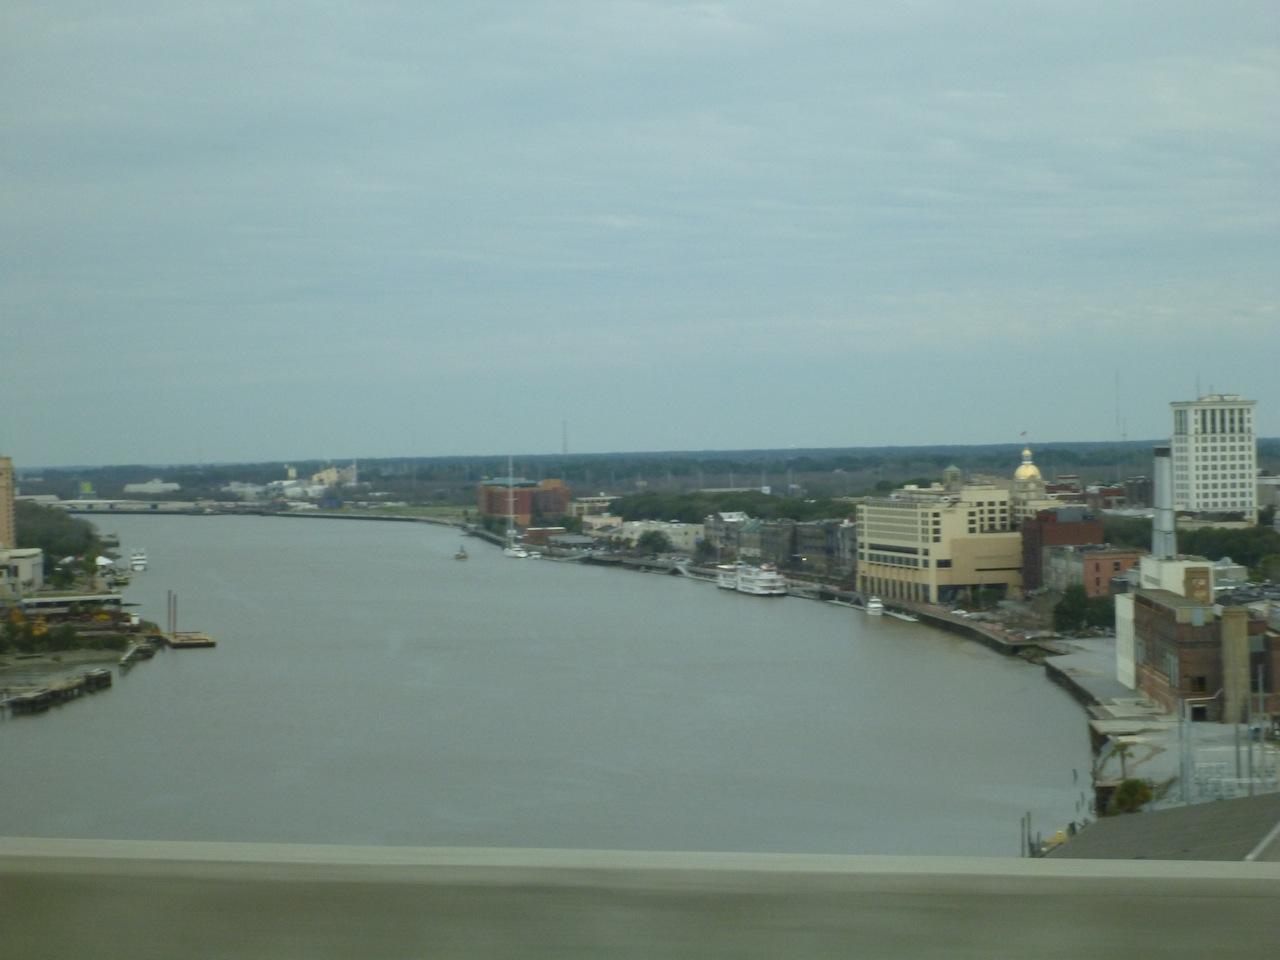 Crossing The Bridge To Savannah, GA